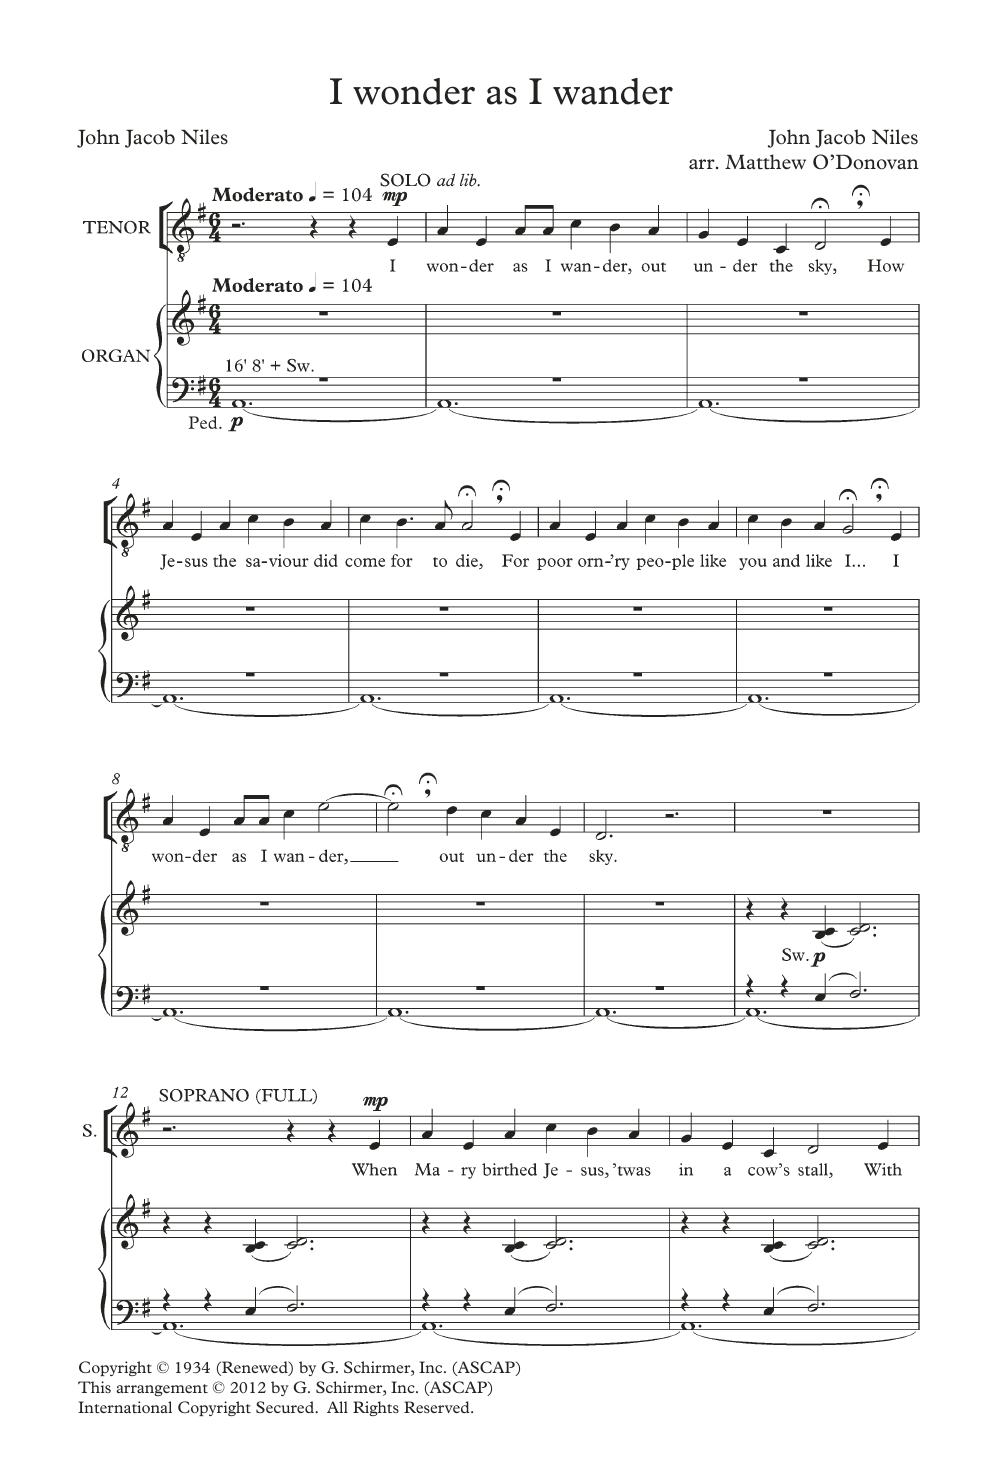 I Wonder As I Wander (arr. Matthew O'Donovan) Sheet Music